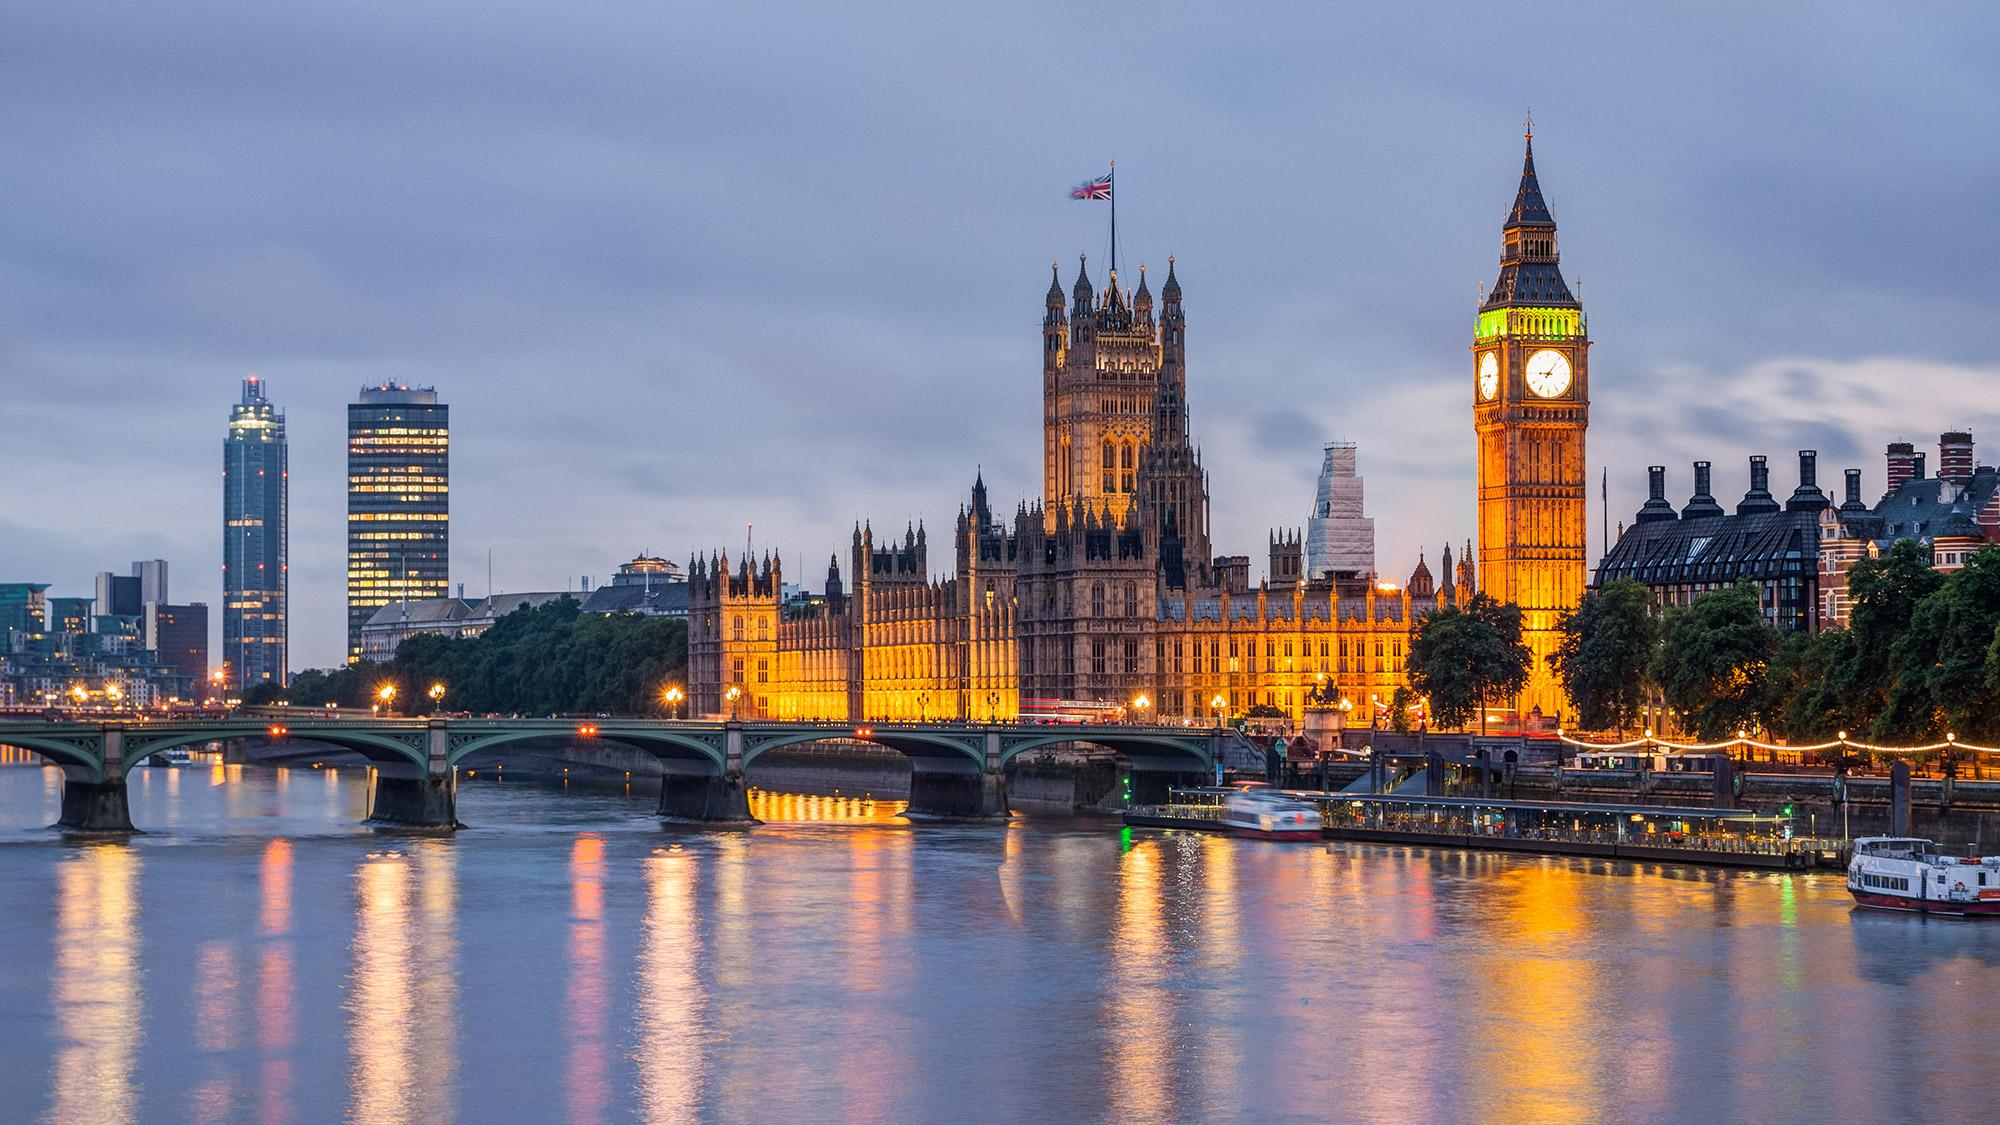 London at dusk [Credit: Bucchi Francesco/Shutterstock.com]